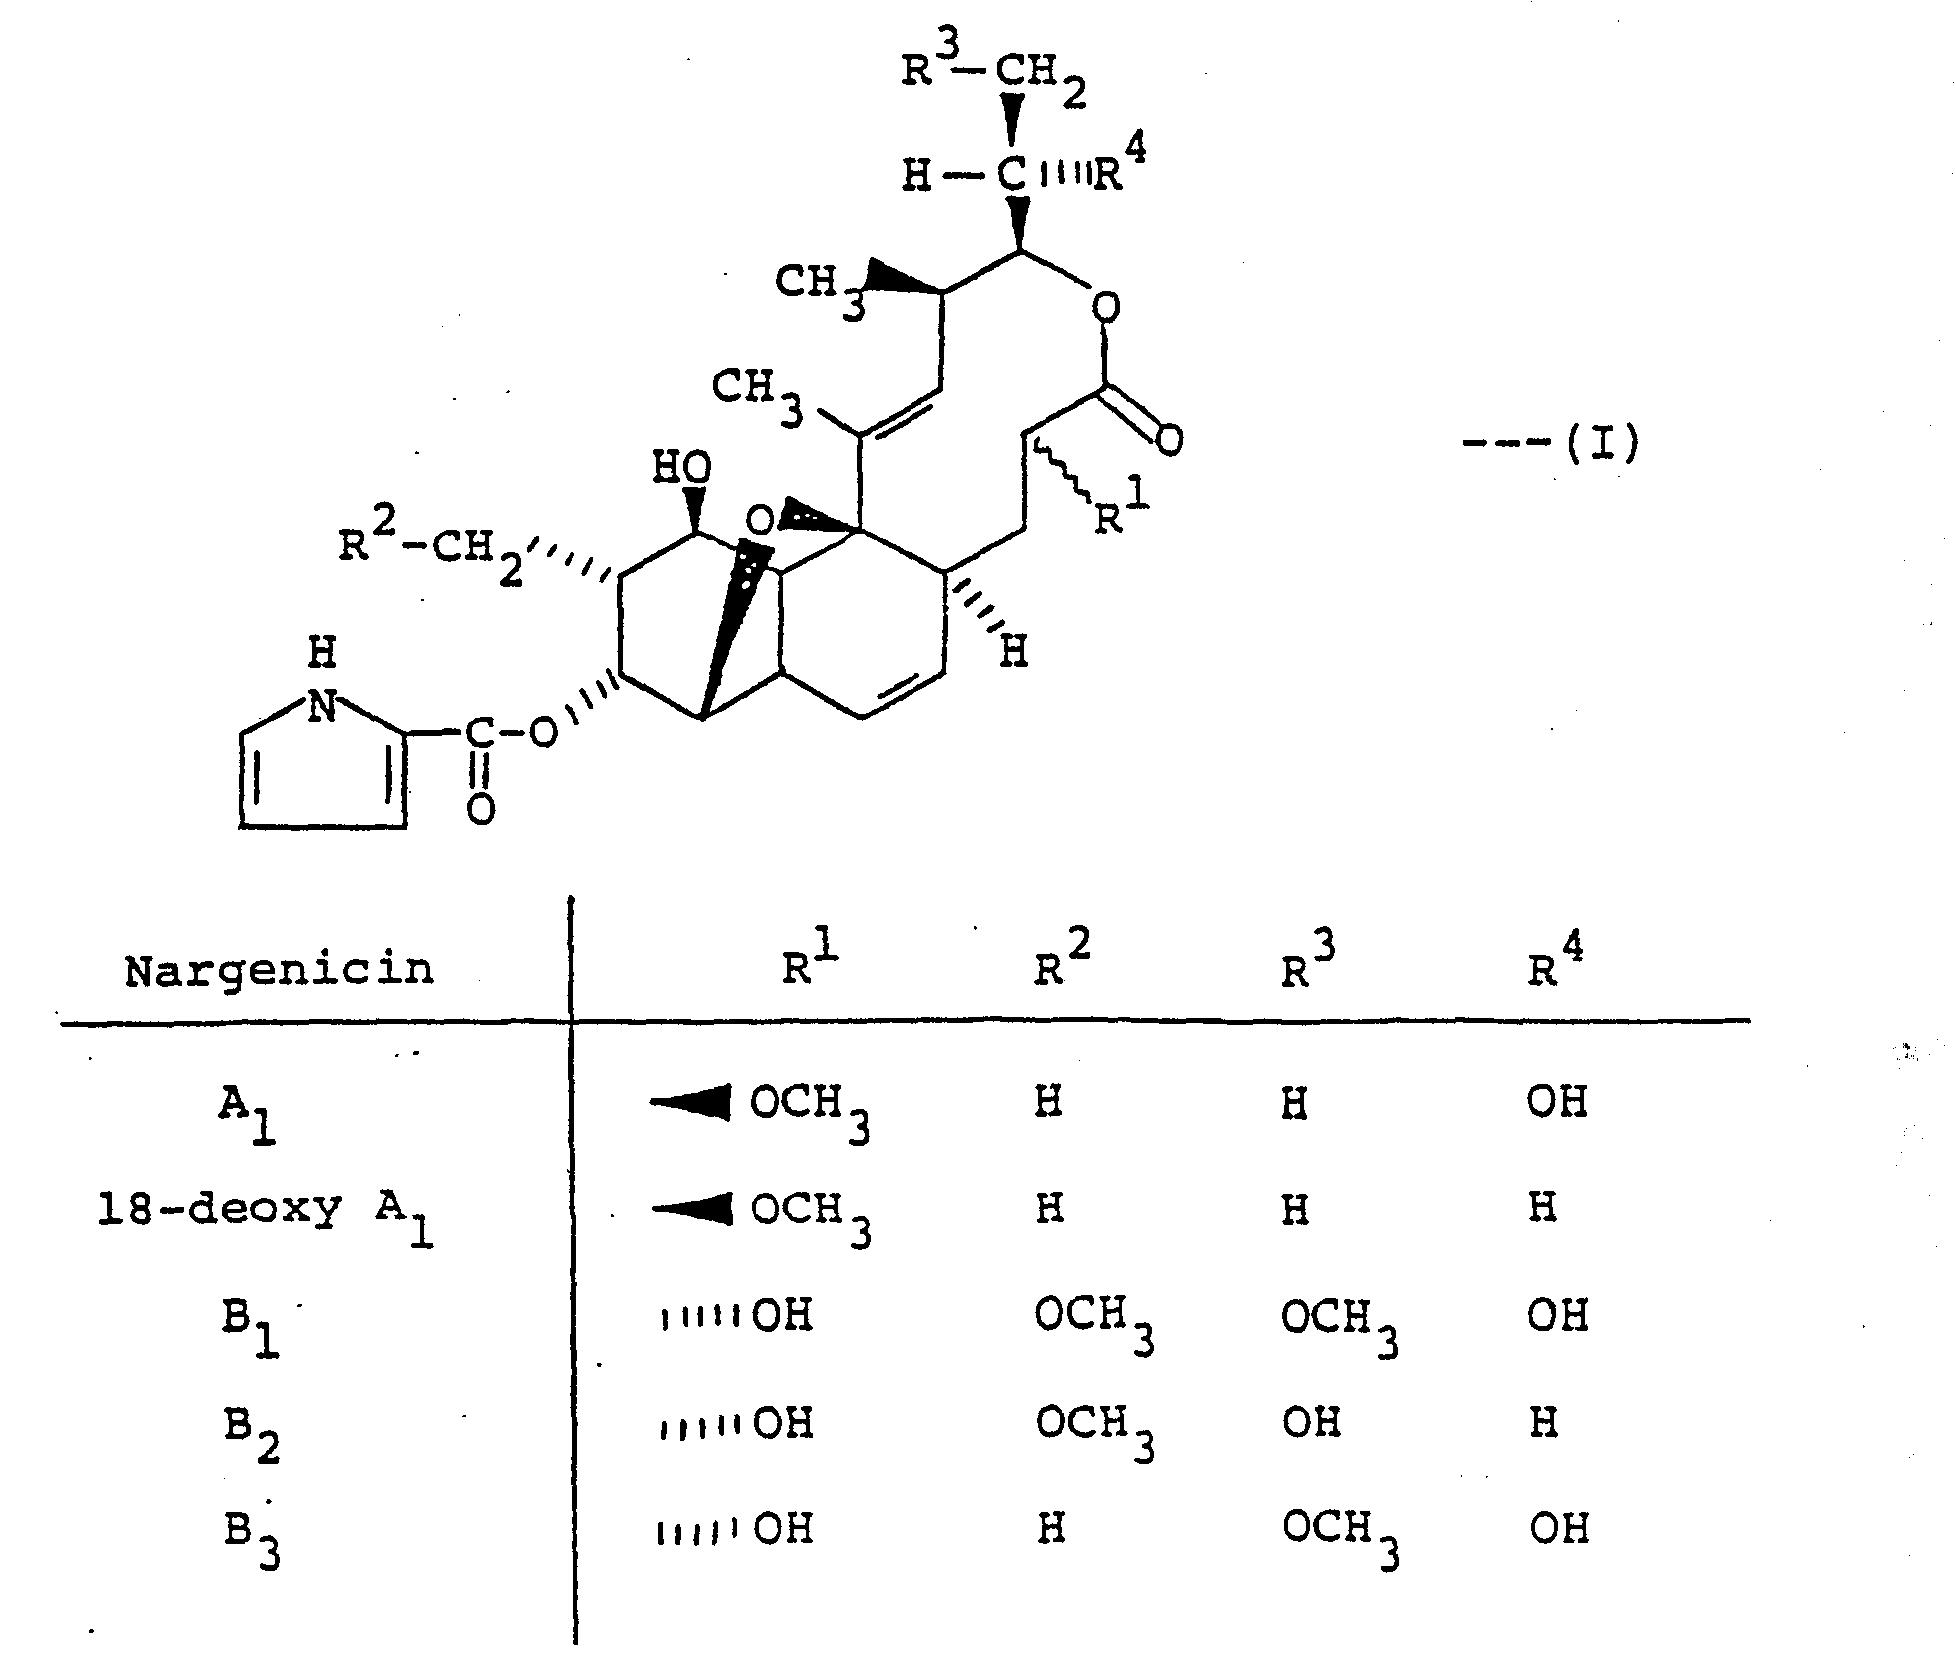 EP0109750A2 - Nargenicin C1 - Google Patents